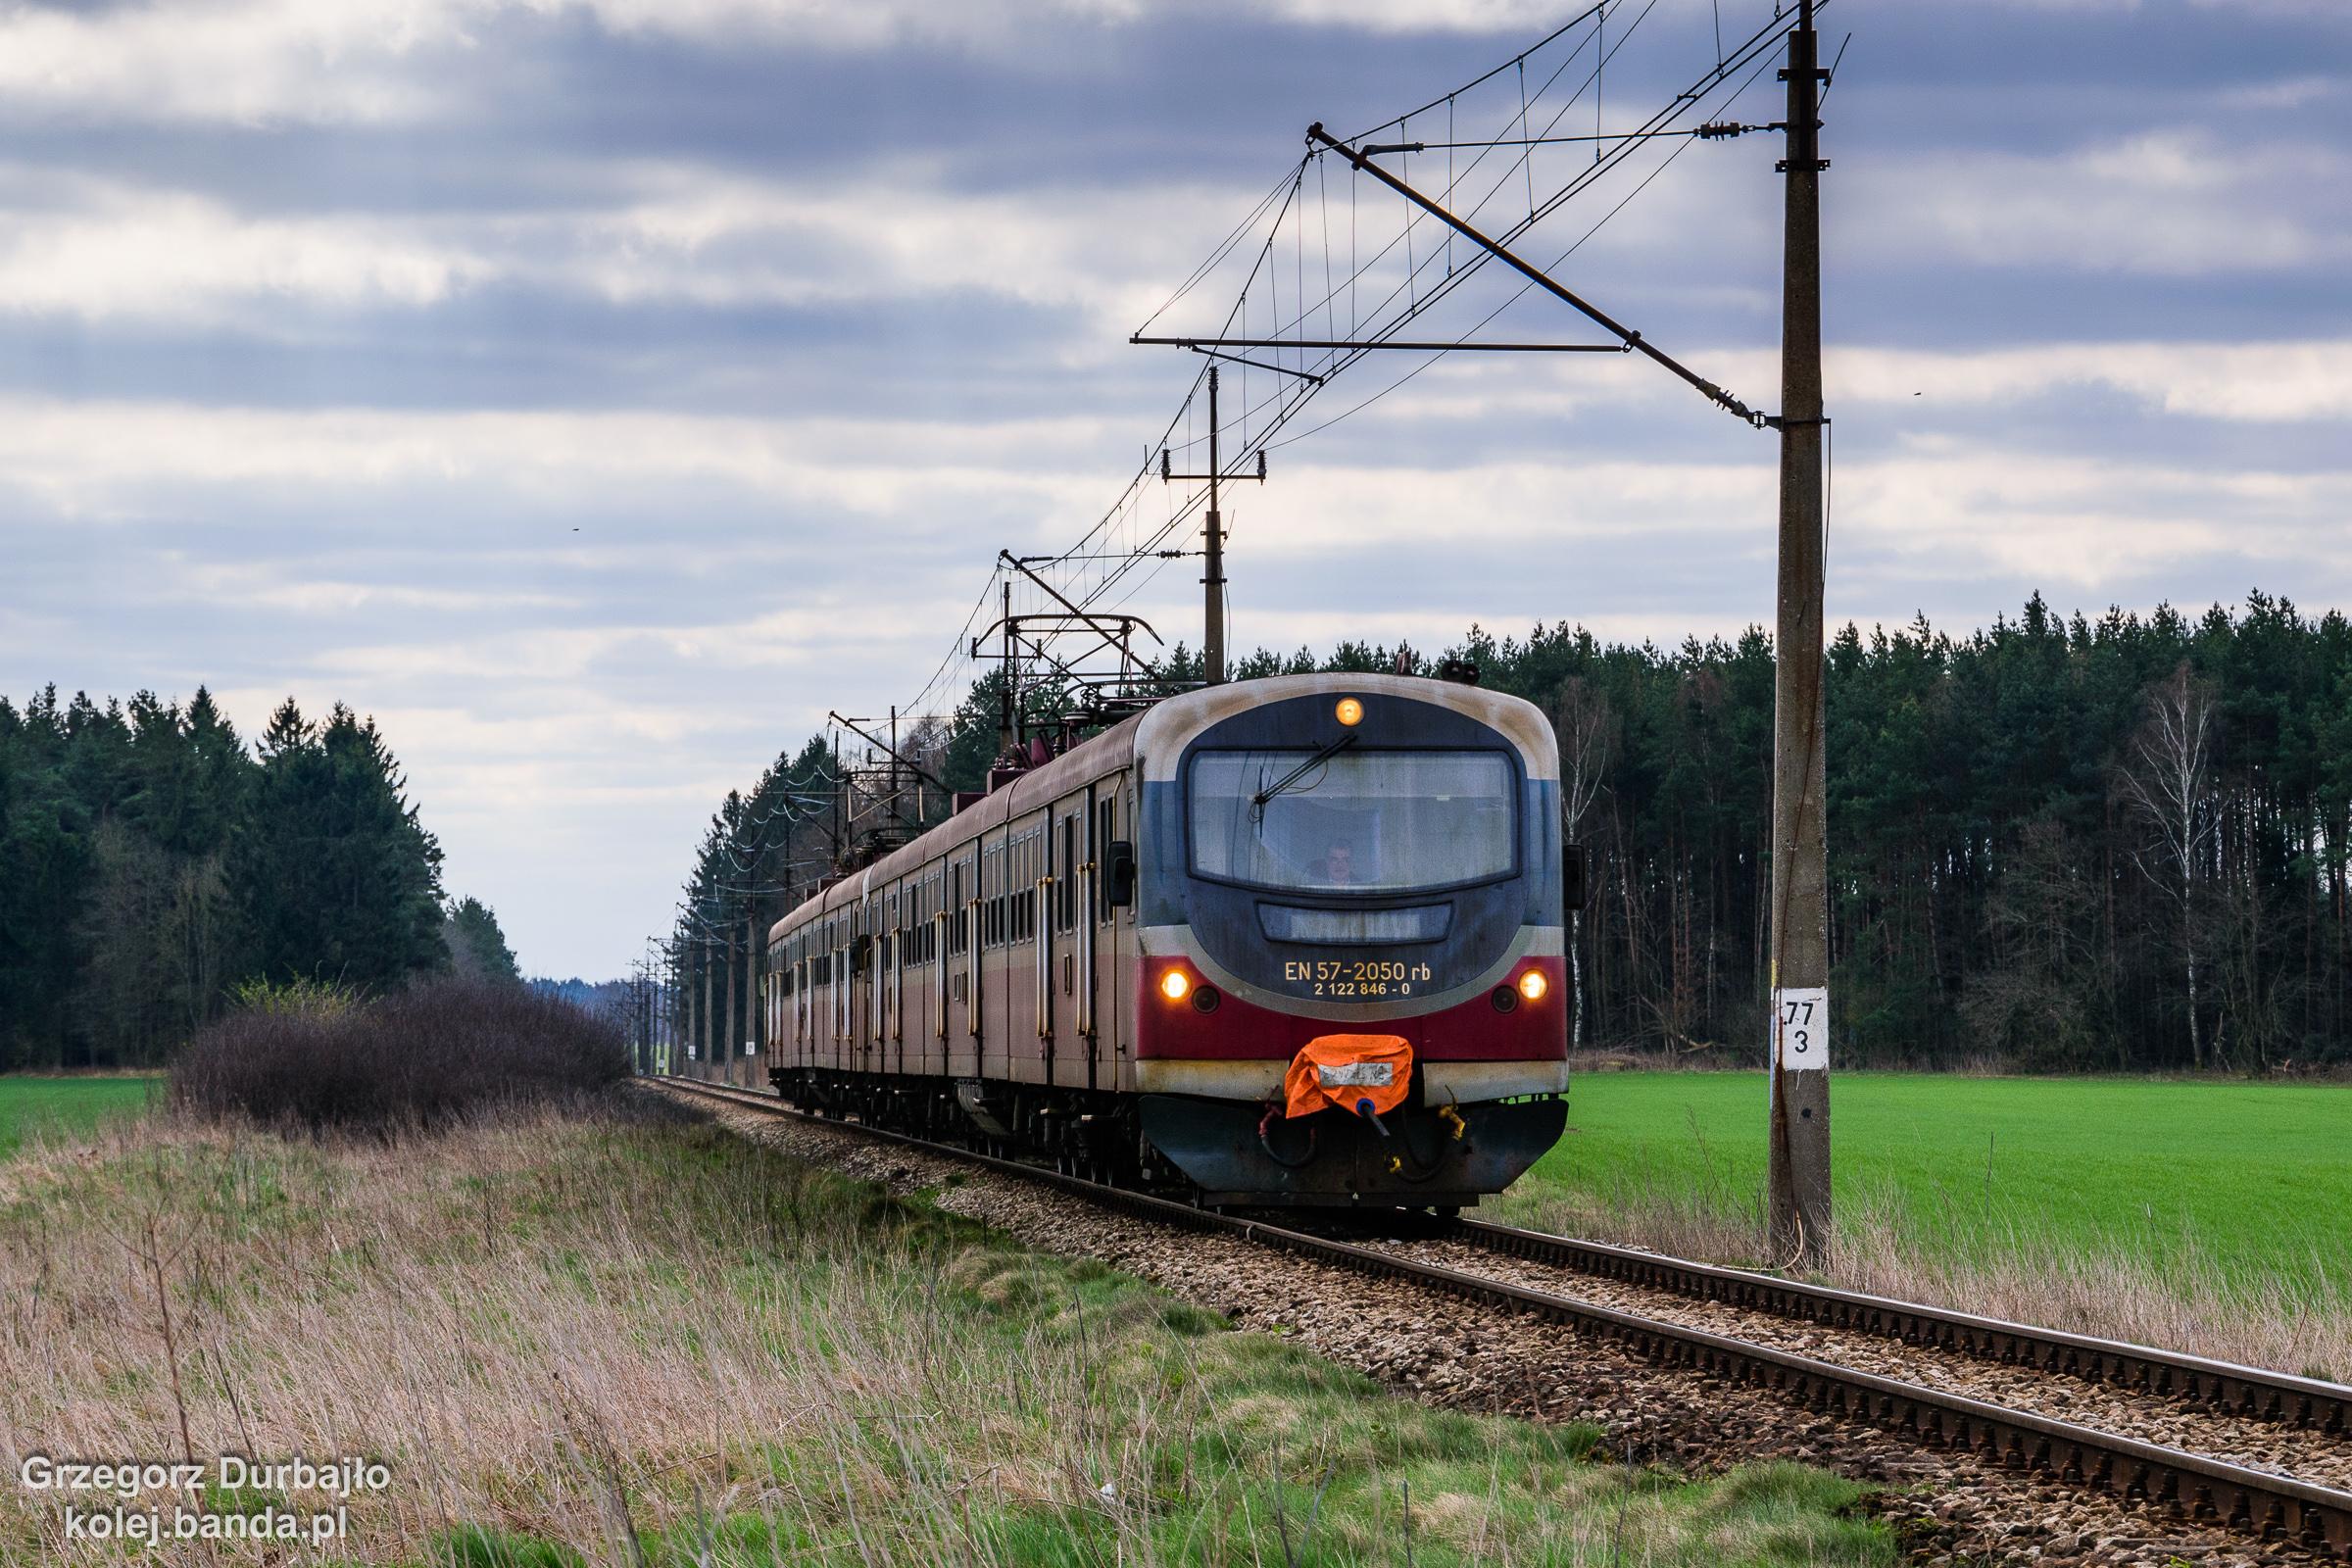 EN57-2050